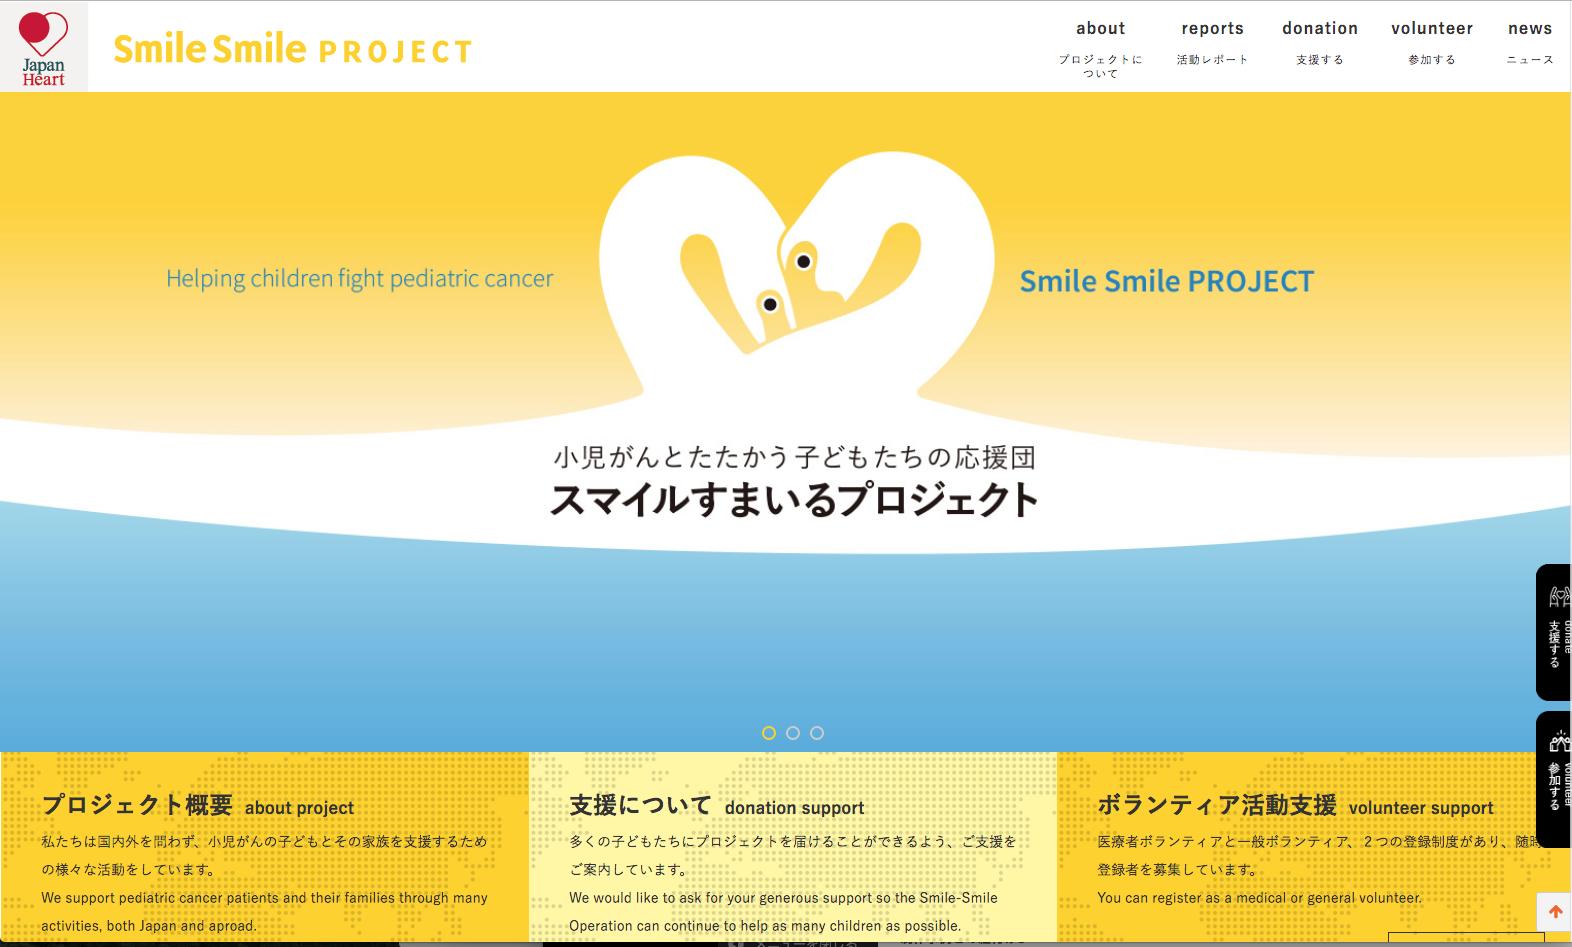 Smile Smile PROJECT(スマイルスマイルプロジェクト)